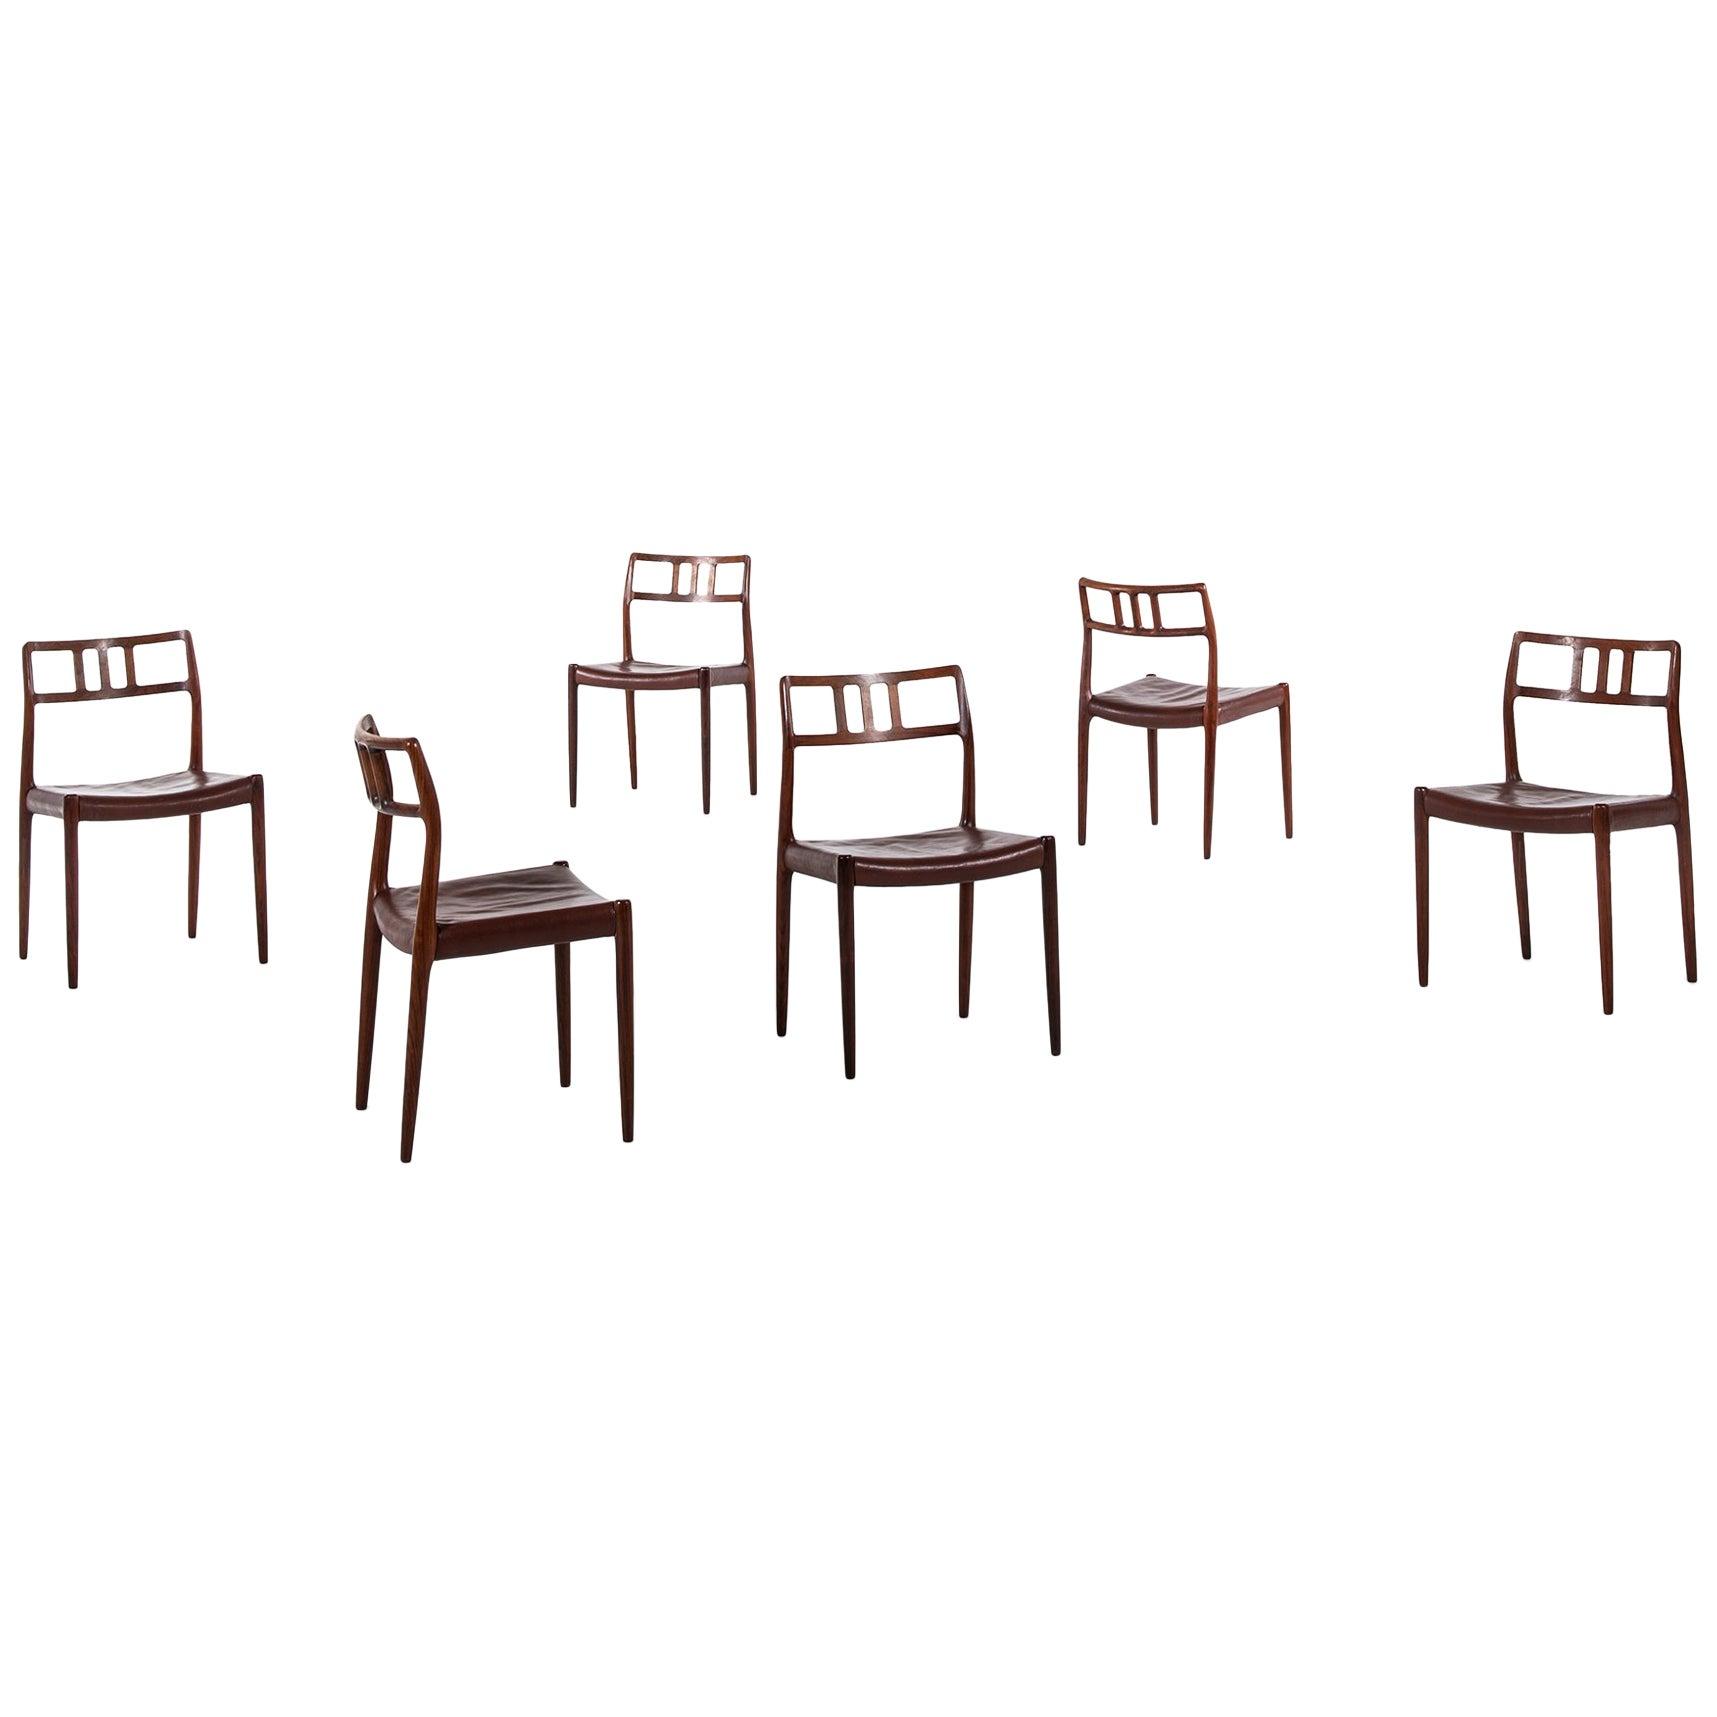 Niels O. Møller Dining Chairs Model 79 by J.L. Møllers Møbelfabrik in Denmark